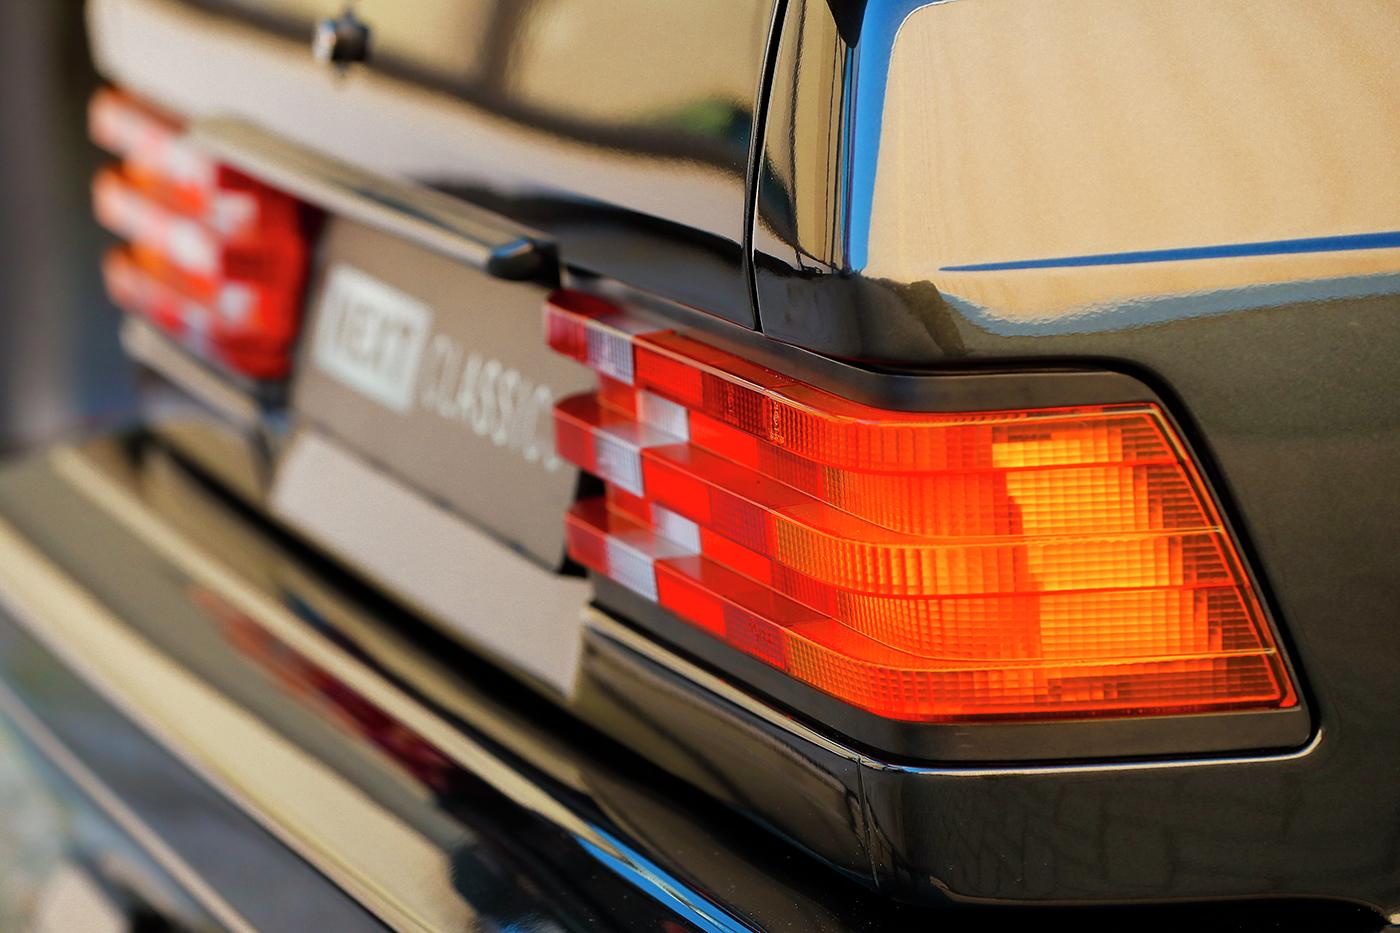 1990_Mercedes-Benz_190E_2.5-16_Evolution_II_0016